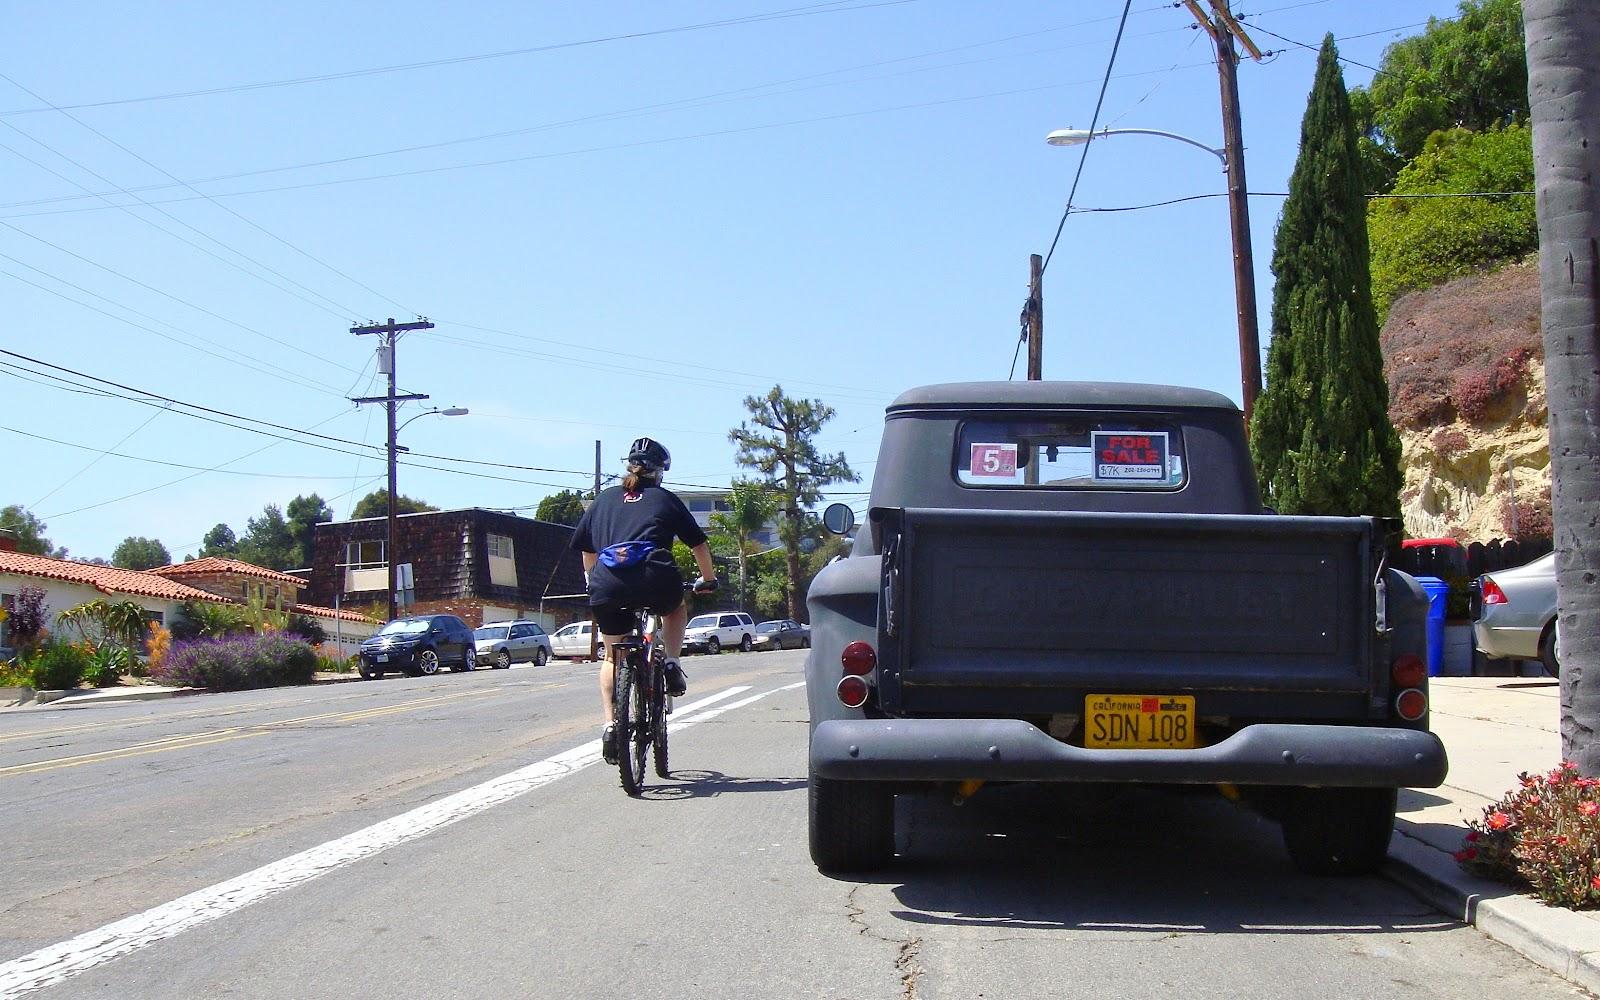 Outdoors Rv For Sale Everett Wa >> Apache Trailers Tacoma Wa | Autos Post